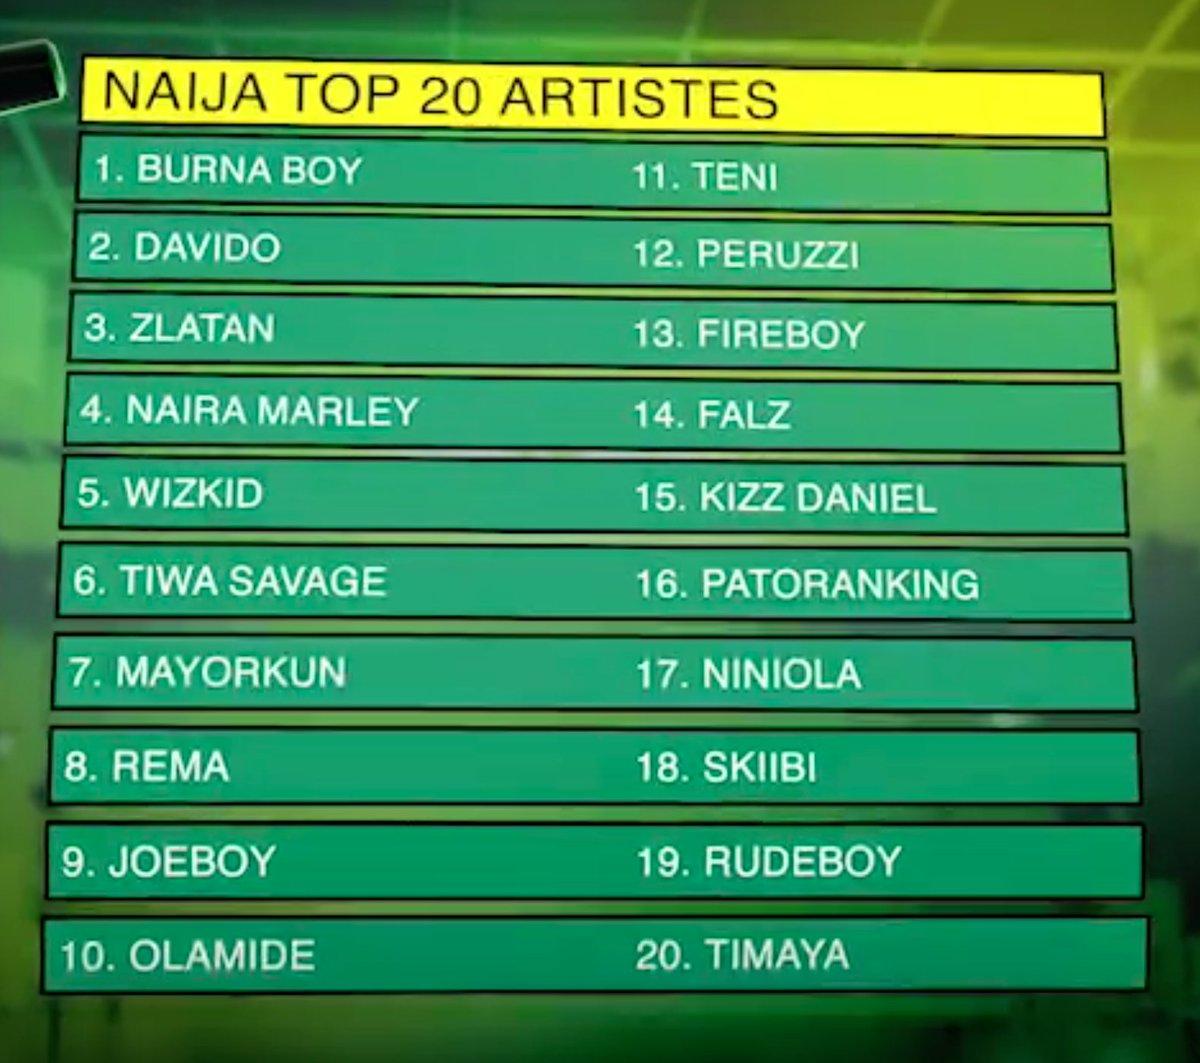 MTV Base Top 20 Nigerian Artistes Of 2019